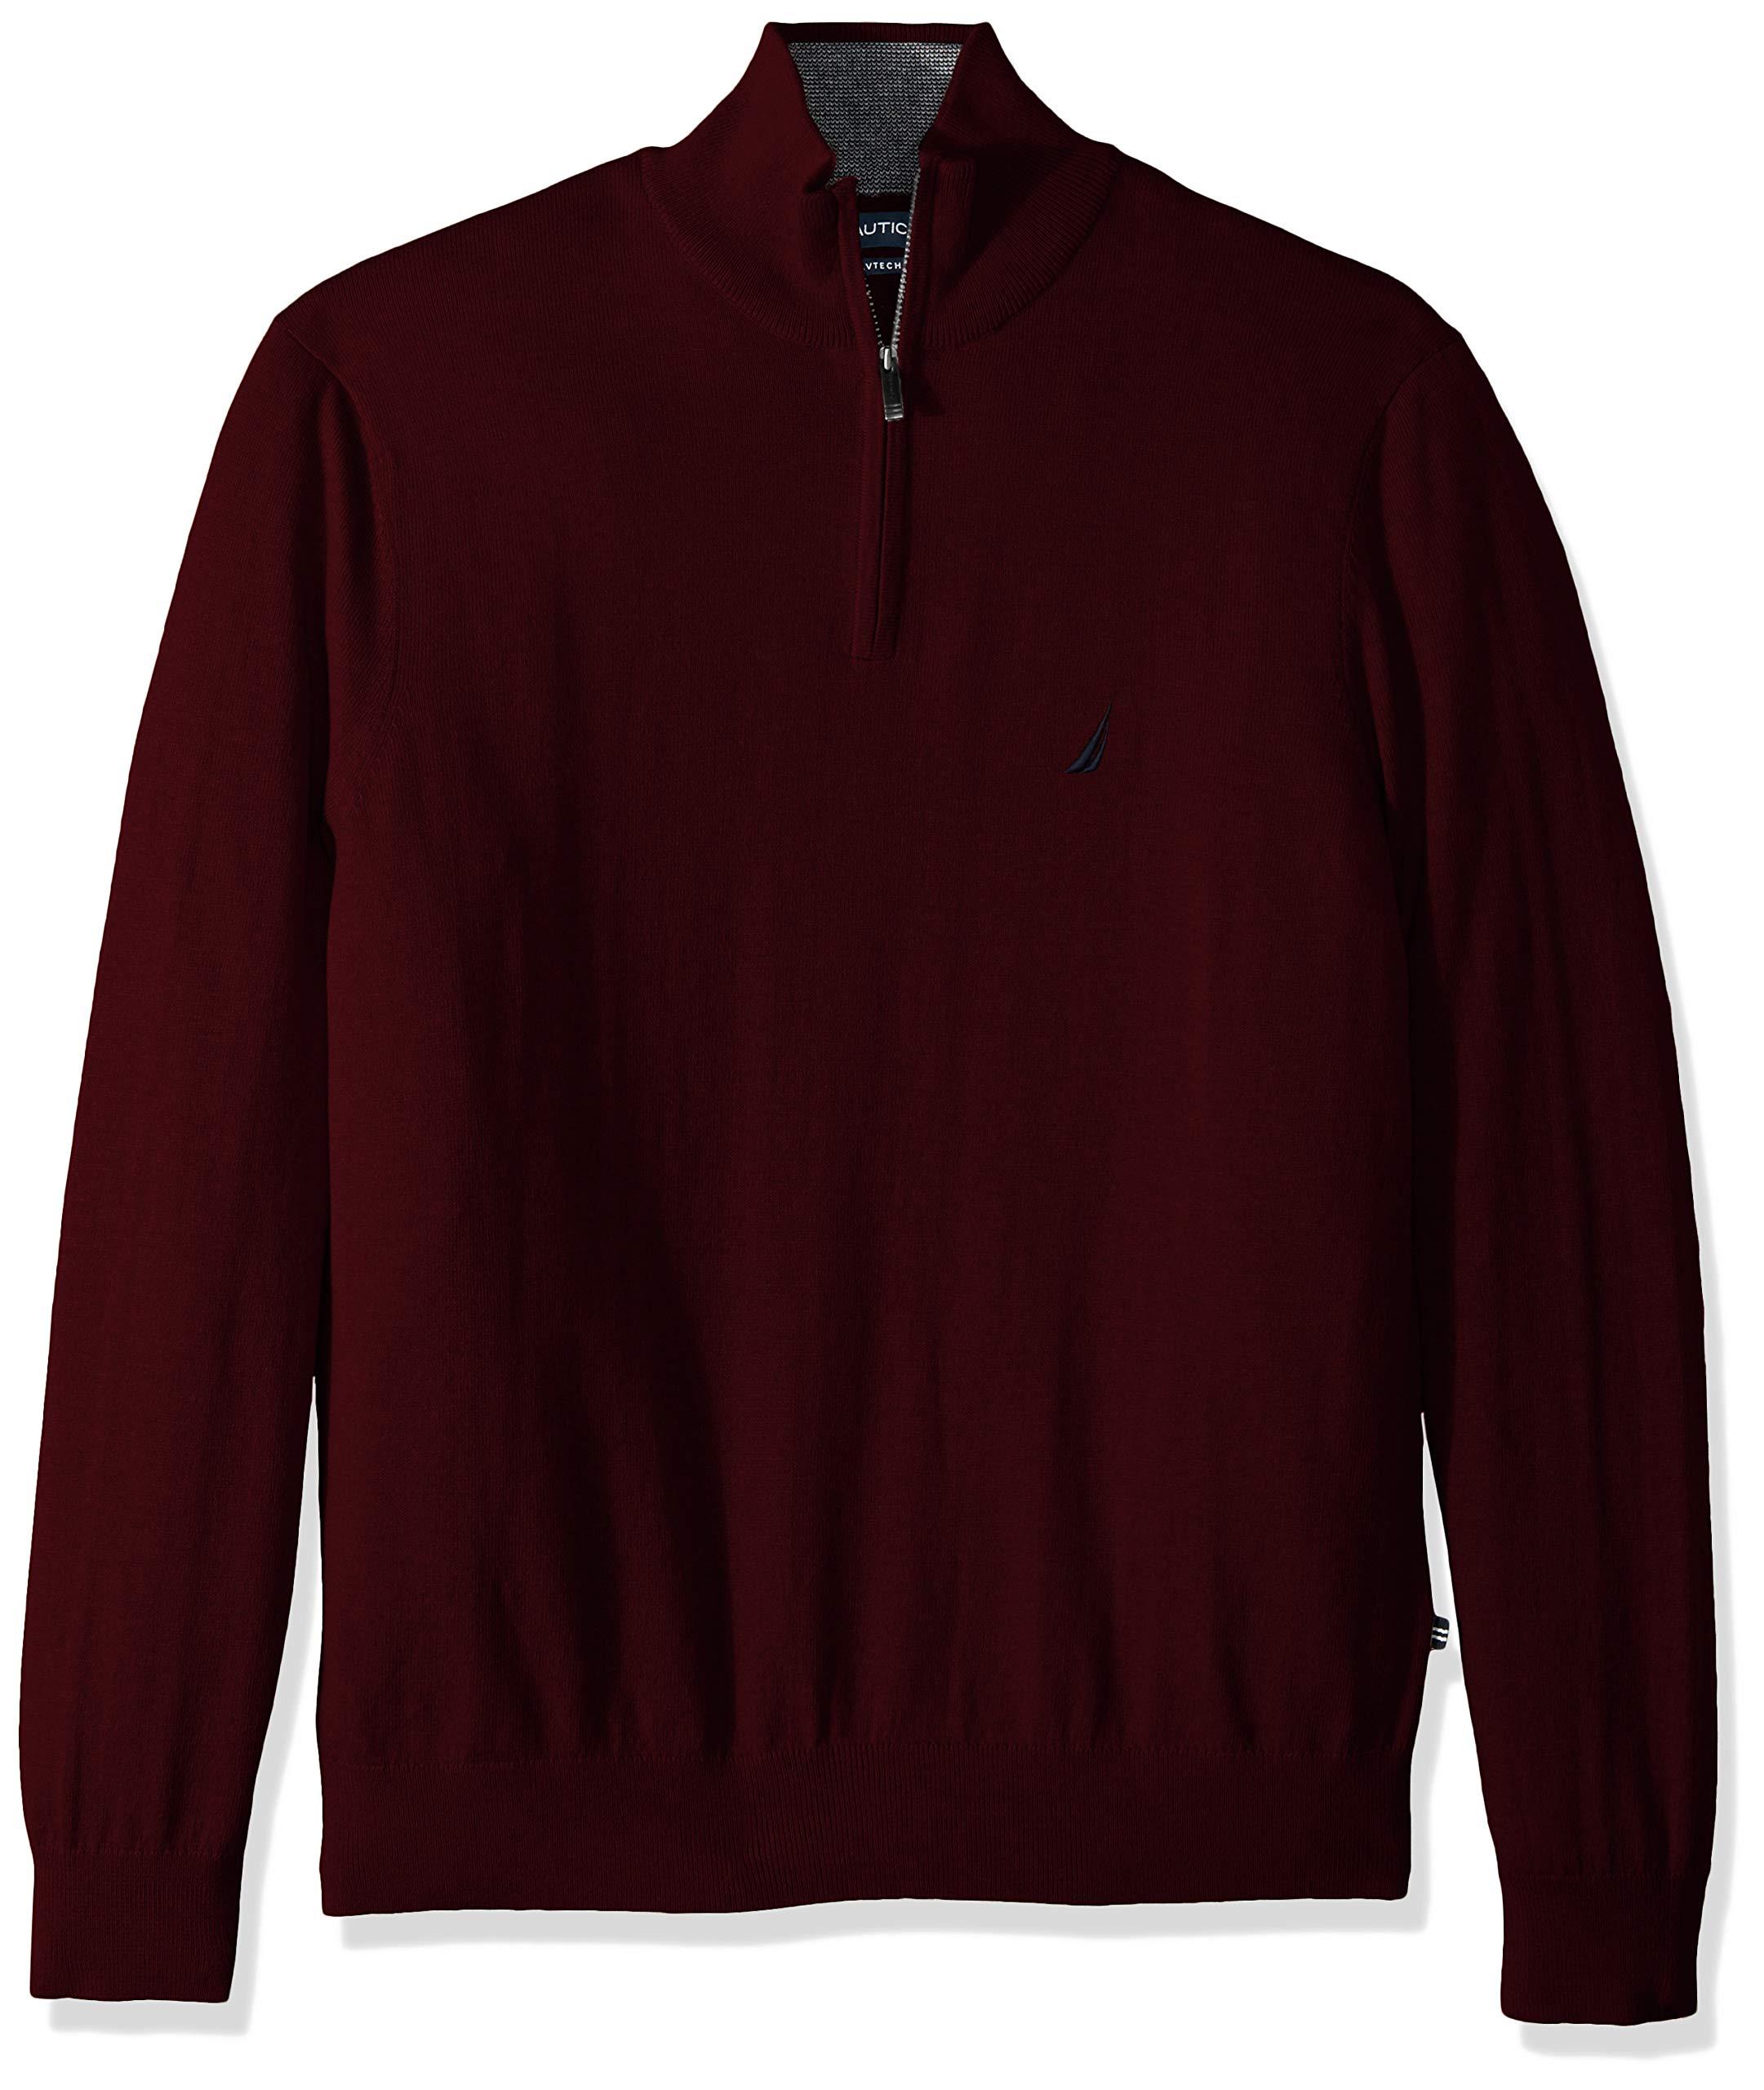 Nautica Men's Long Sleeve 1/4 Zip Sweater, Royal Burgundy, XX-Large